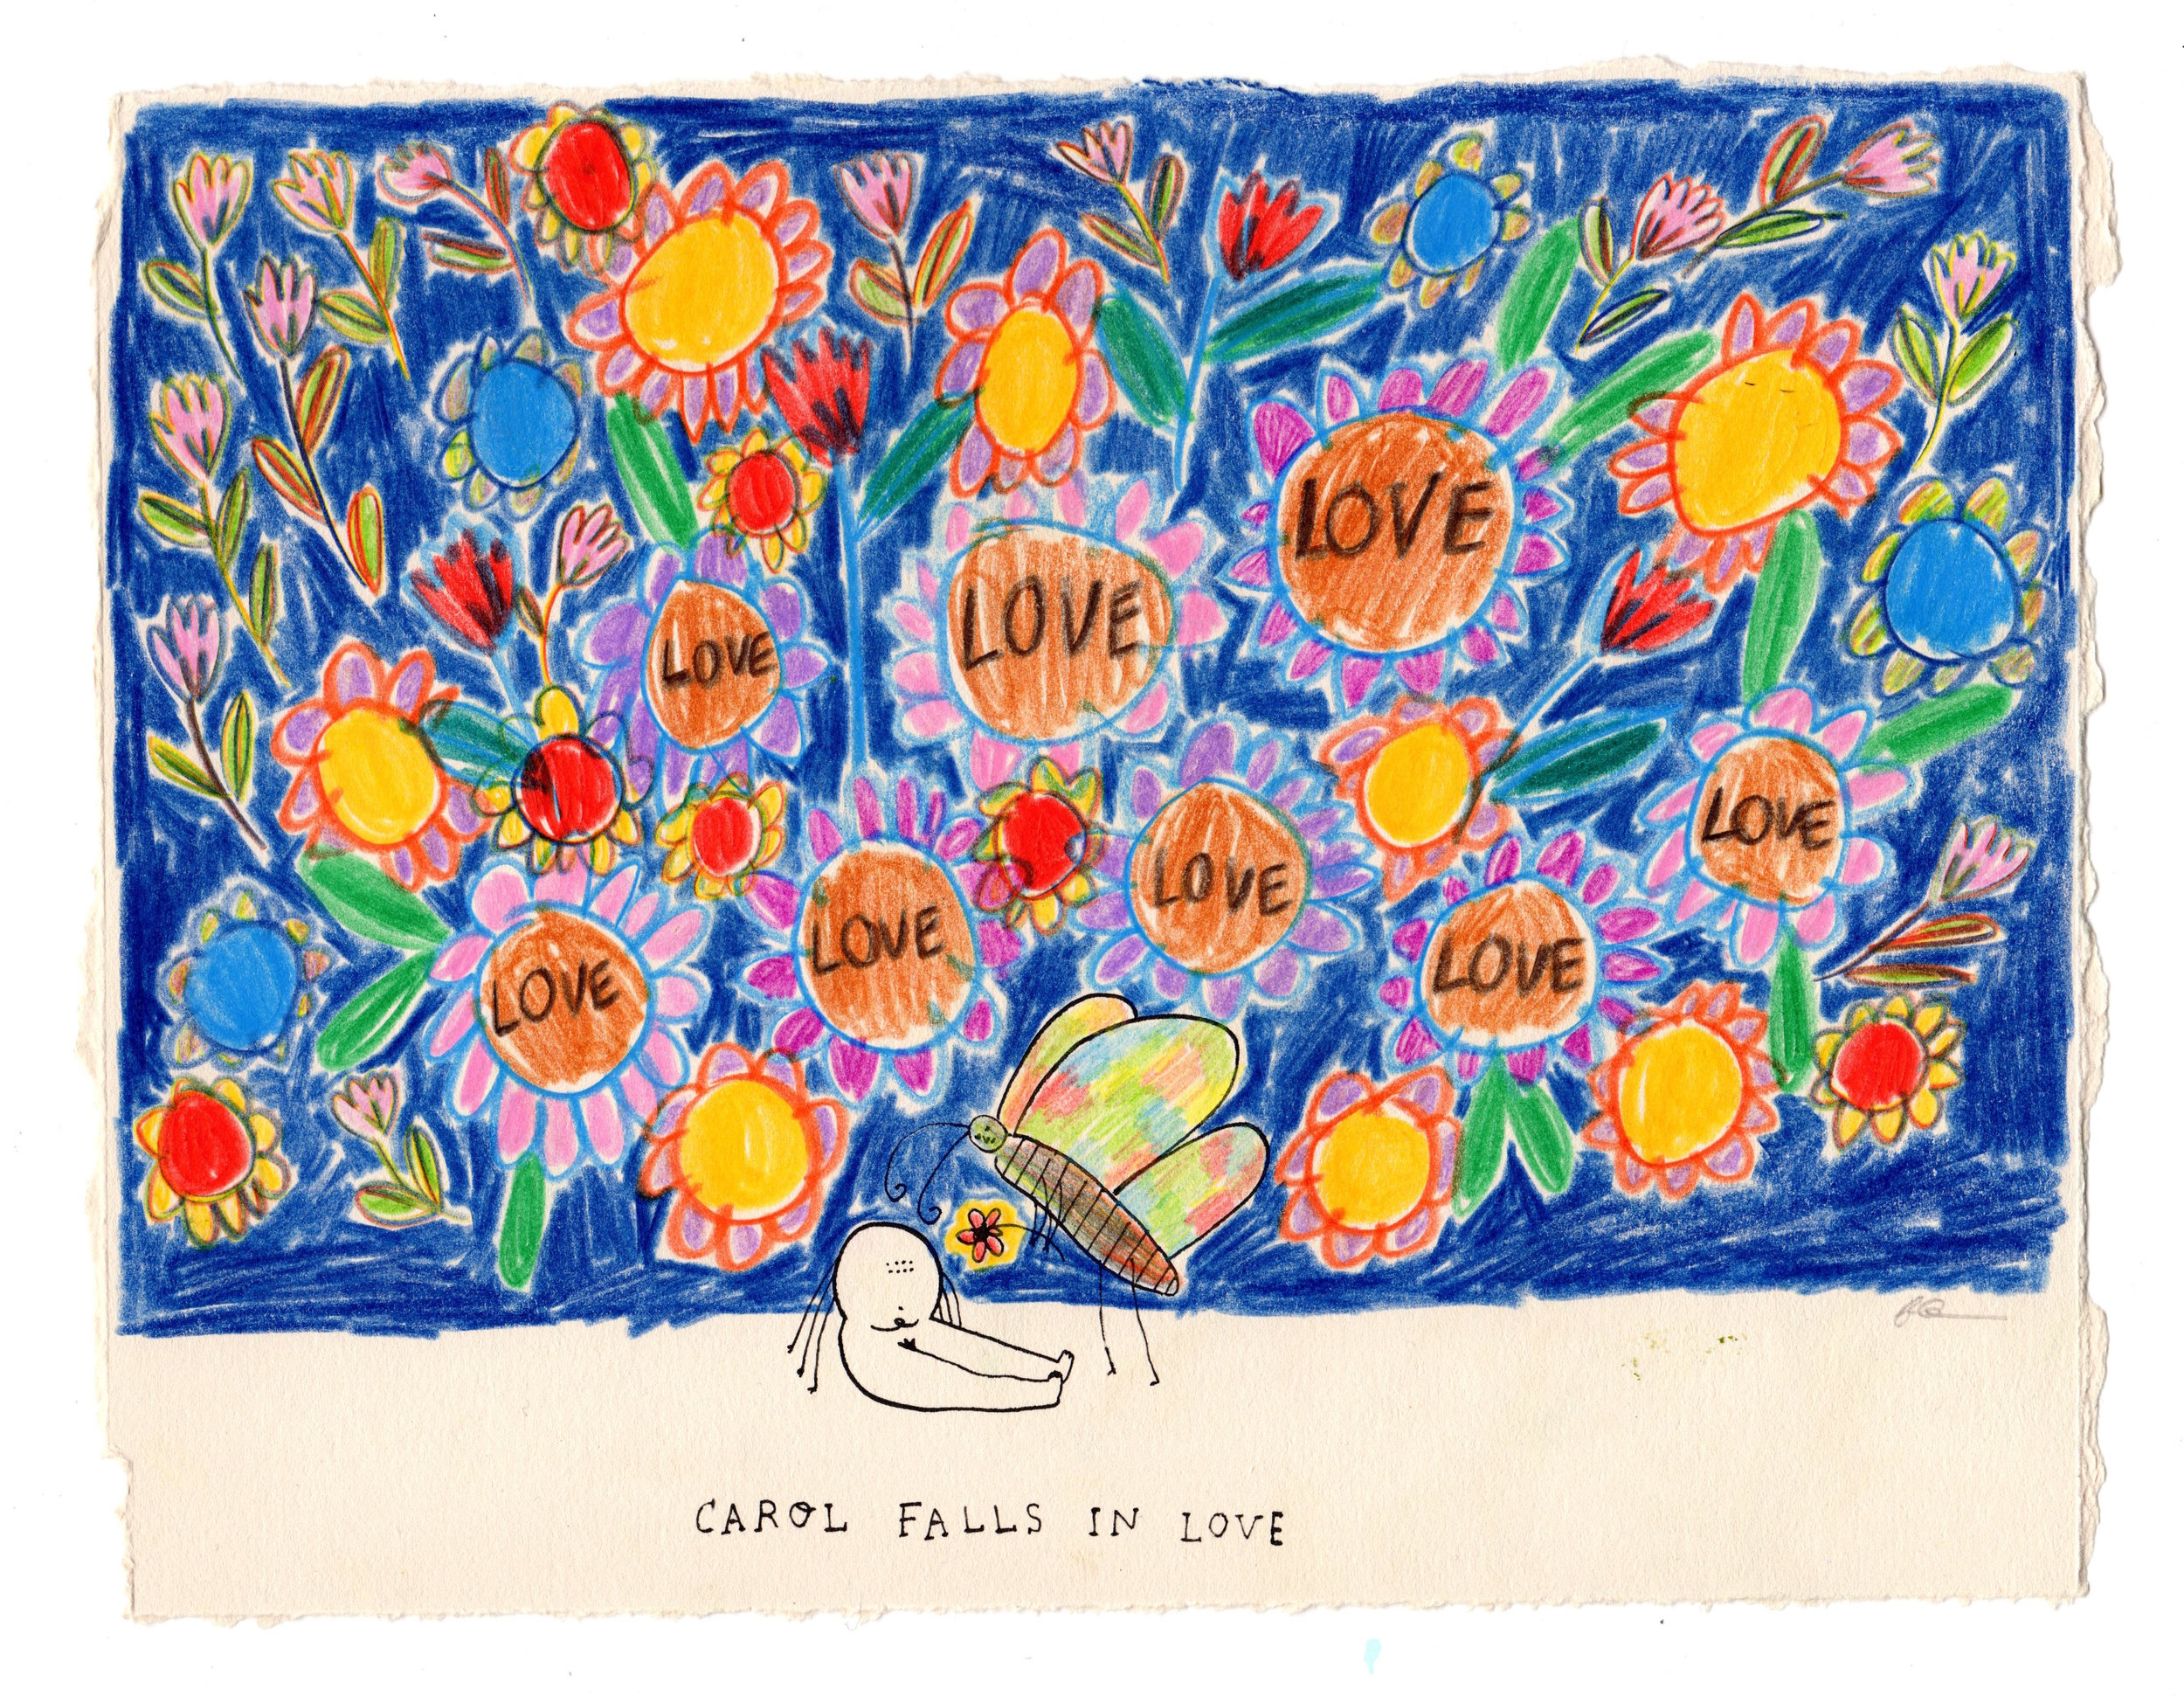 carol falls in love.jpg